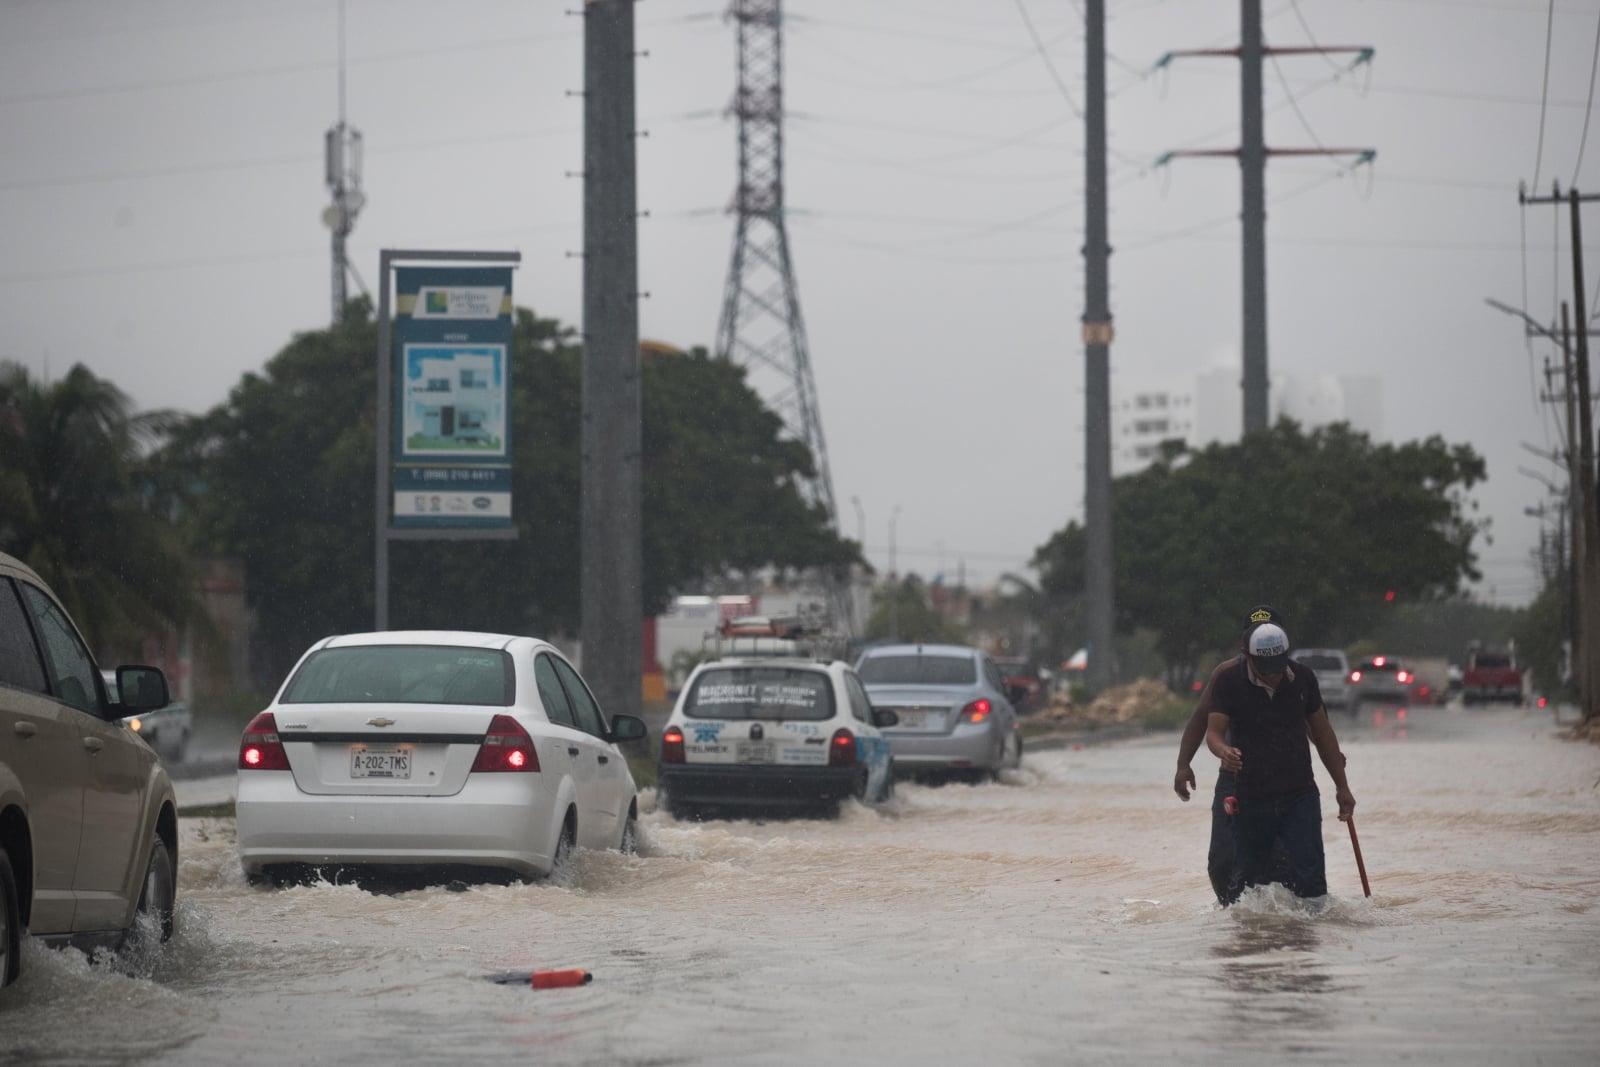 Powodzie w Meksyku, Fot. PAP/EPA/Alberto Valdez